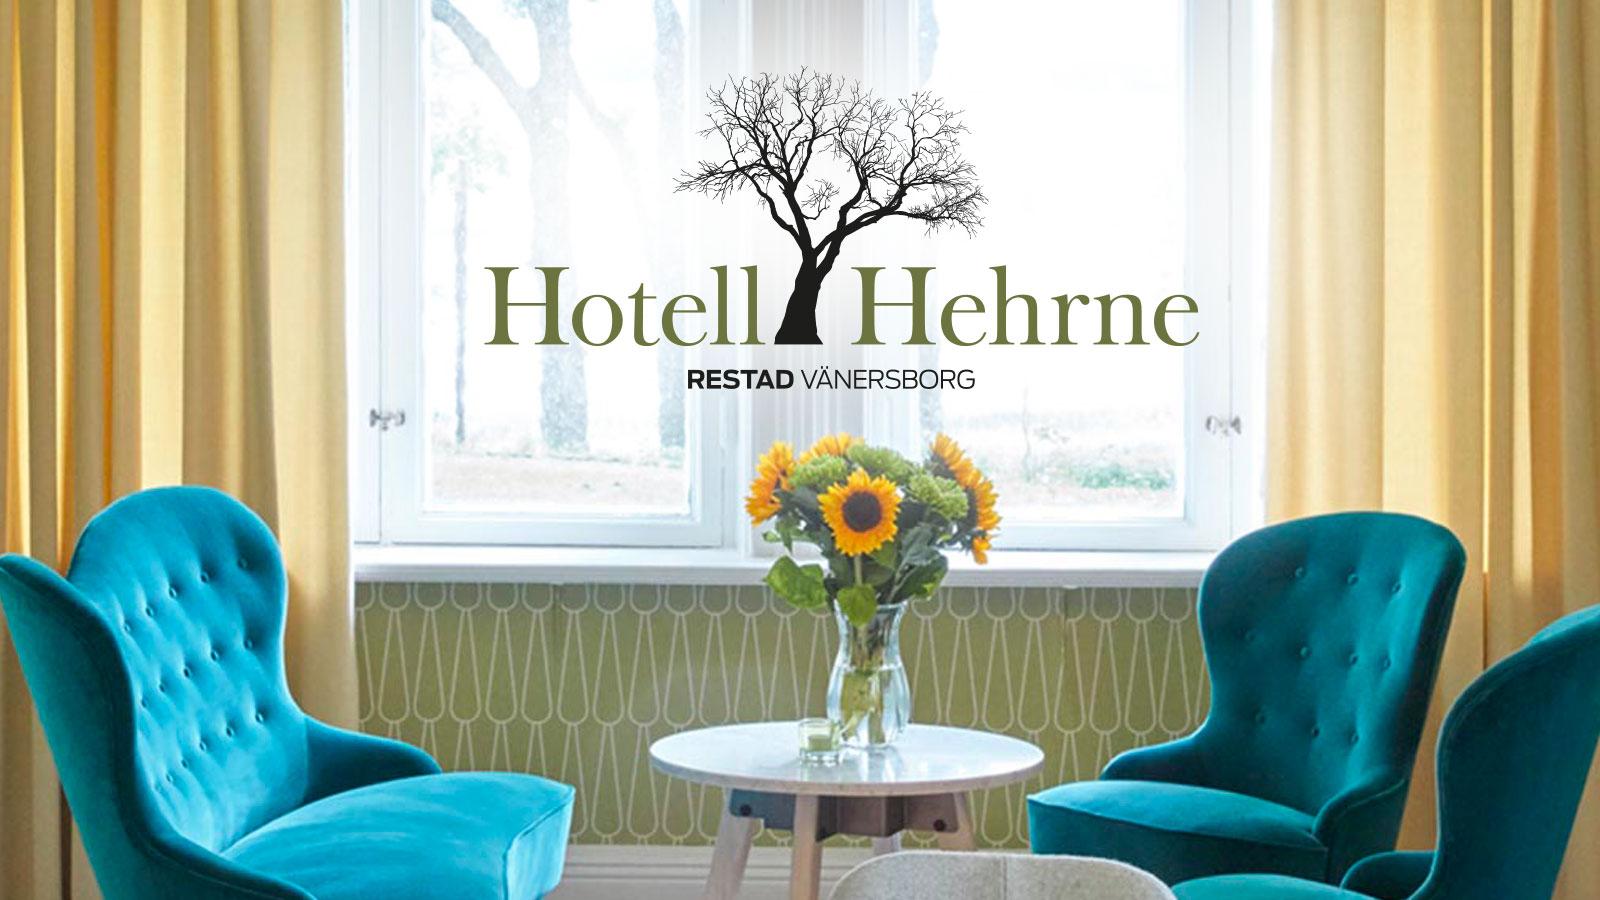 hotellhehrne_strandlund